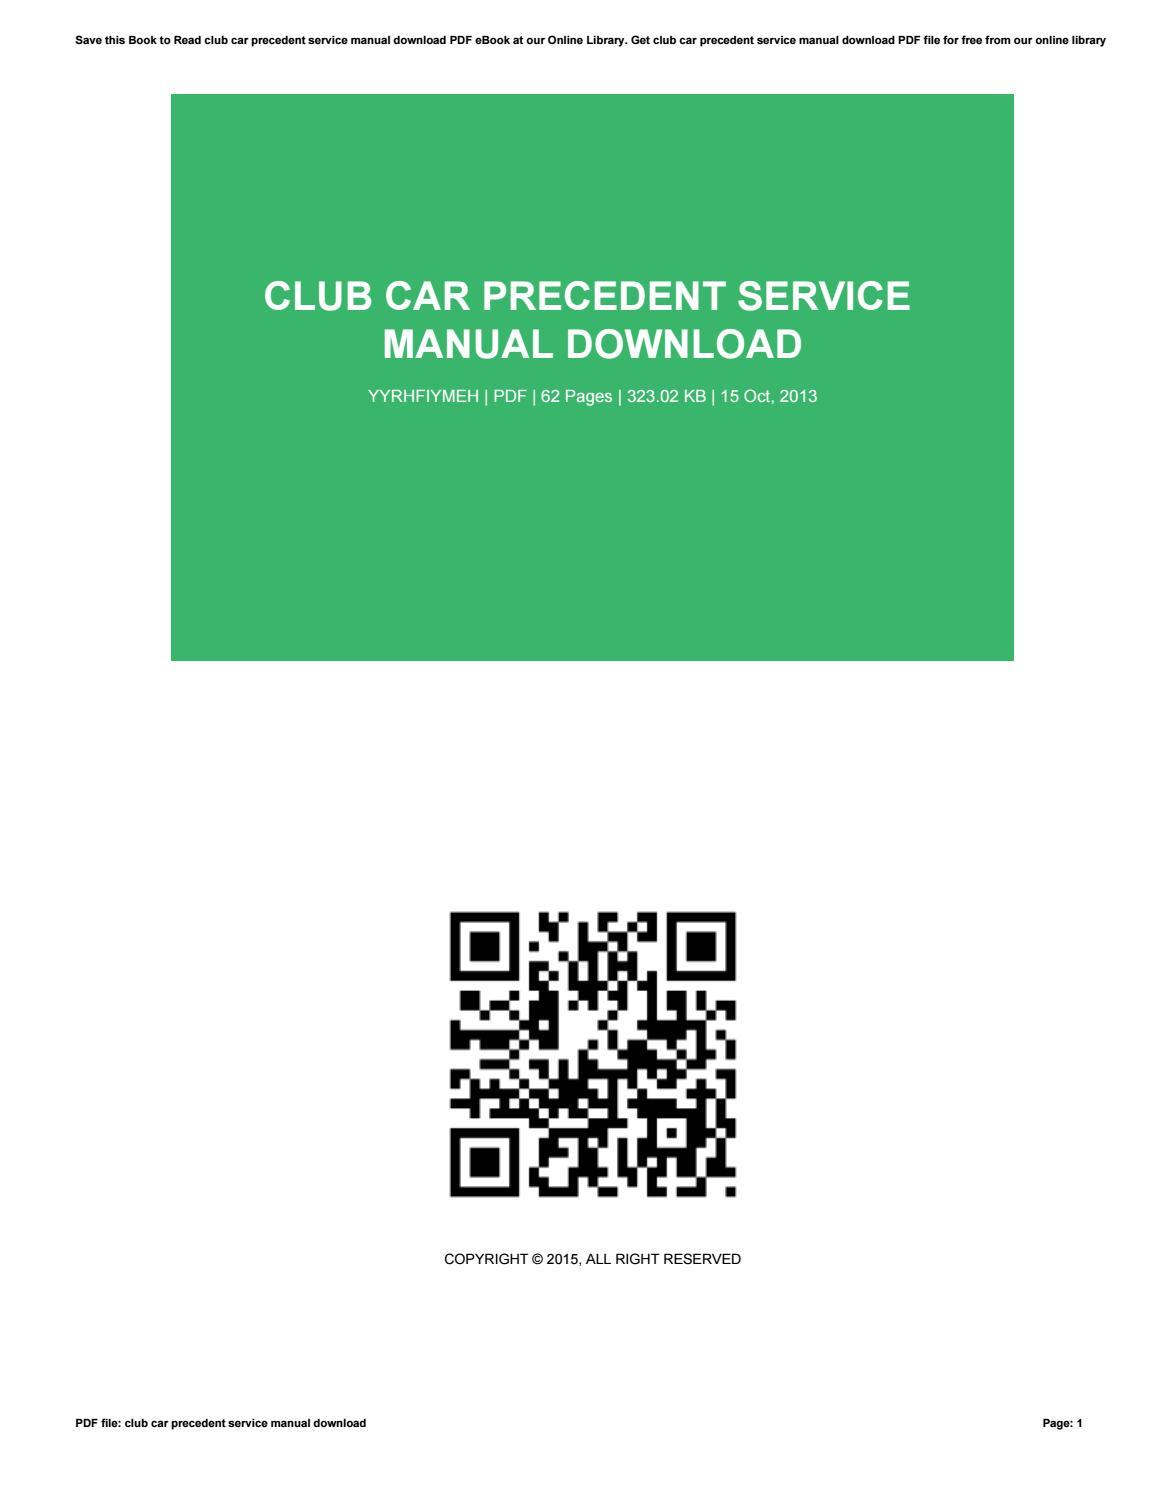 Club car precedent service manual download by